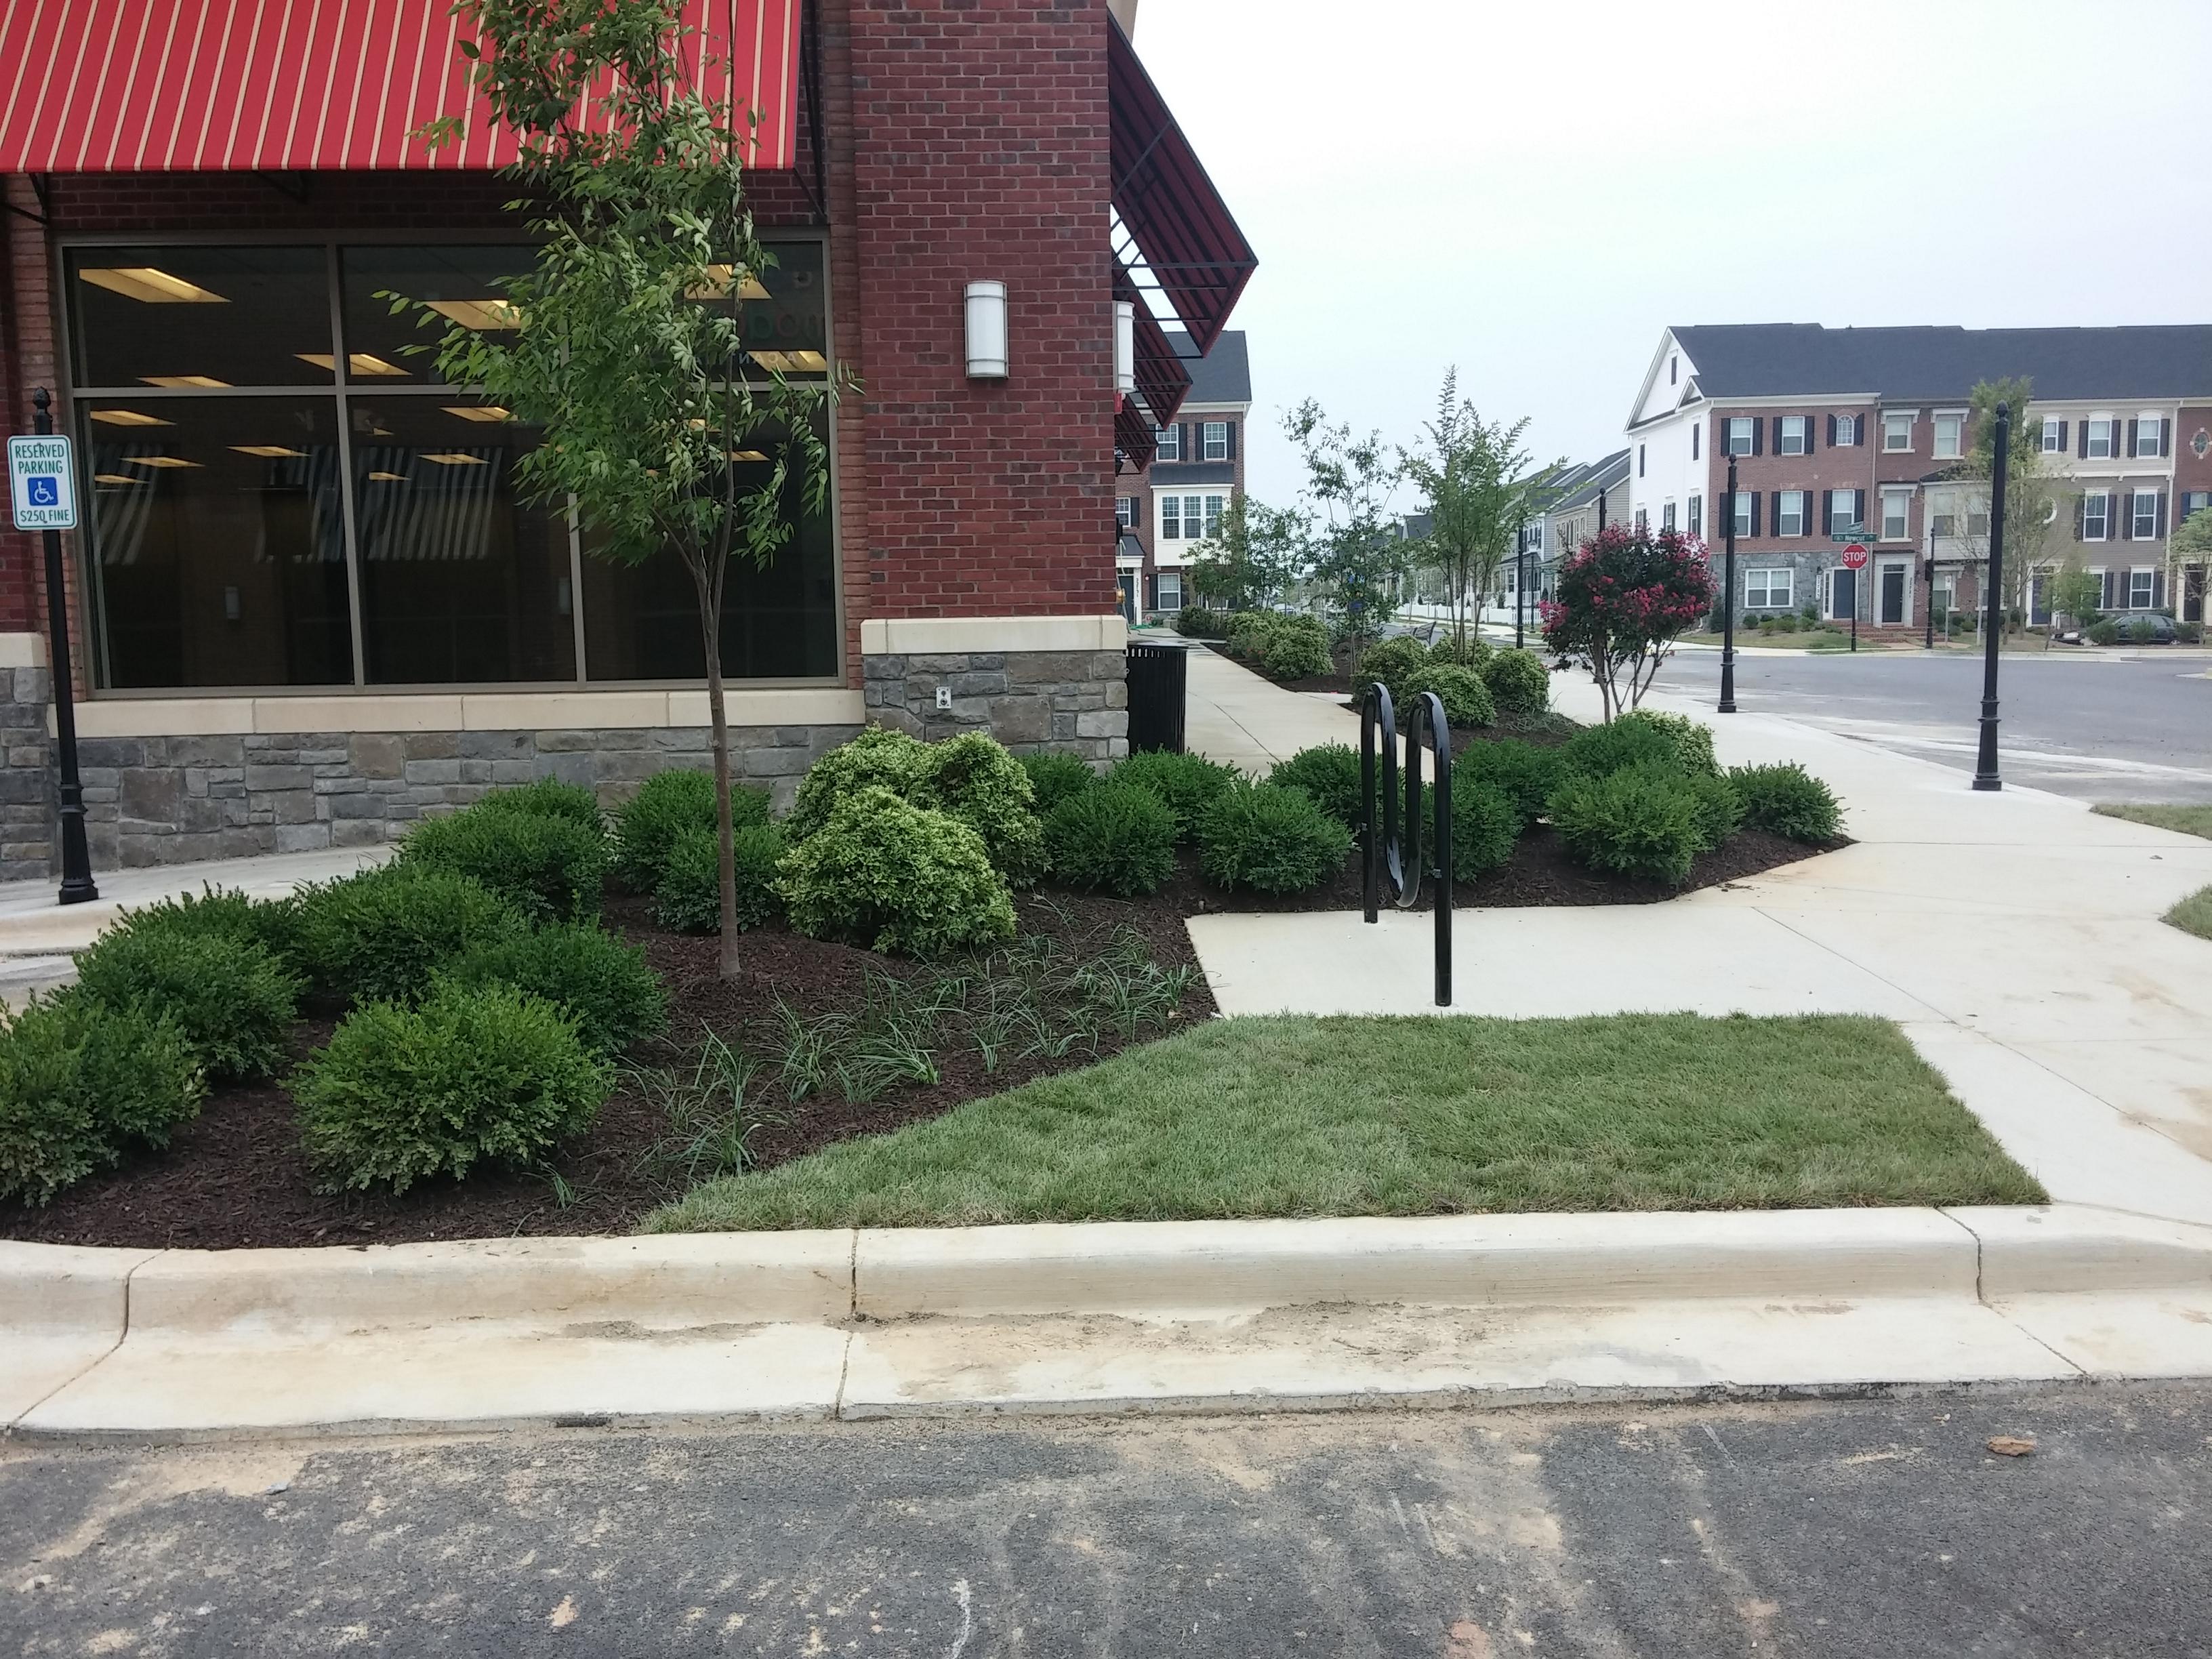 Clarksburg Community & Town Center